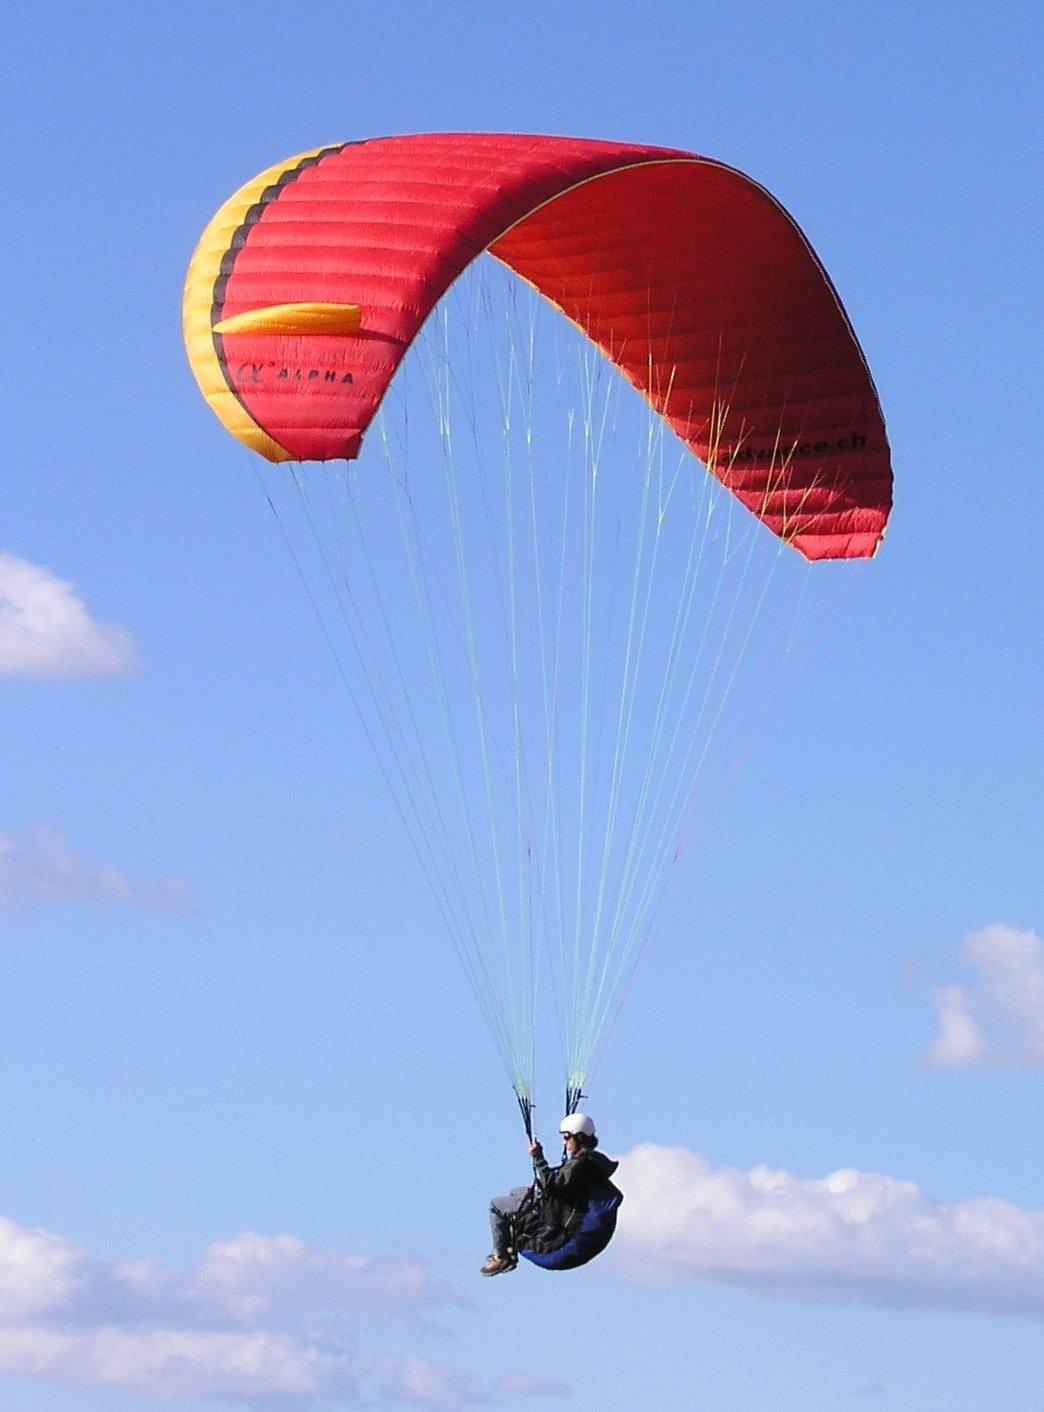 Himachal Pradesh: Paragliding